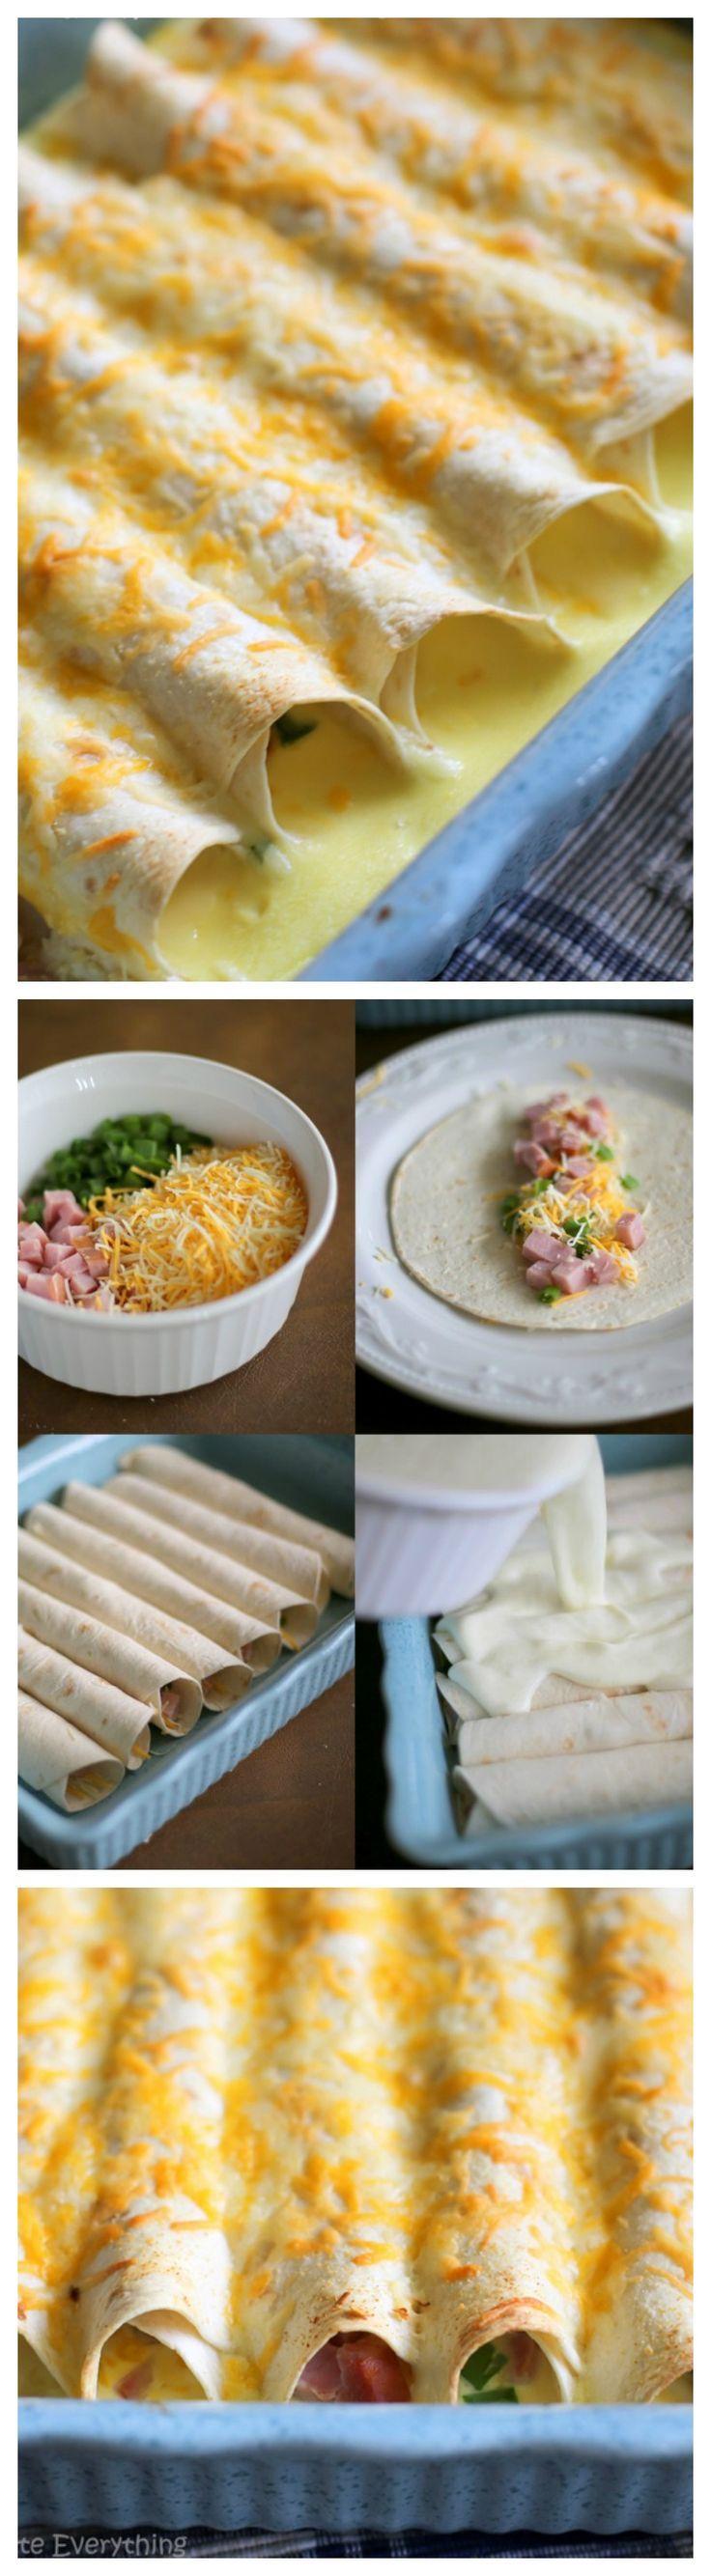 Ham company -  Ham And Cheese Breakfast Enchiladas Prepared The Night Before